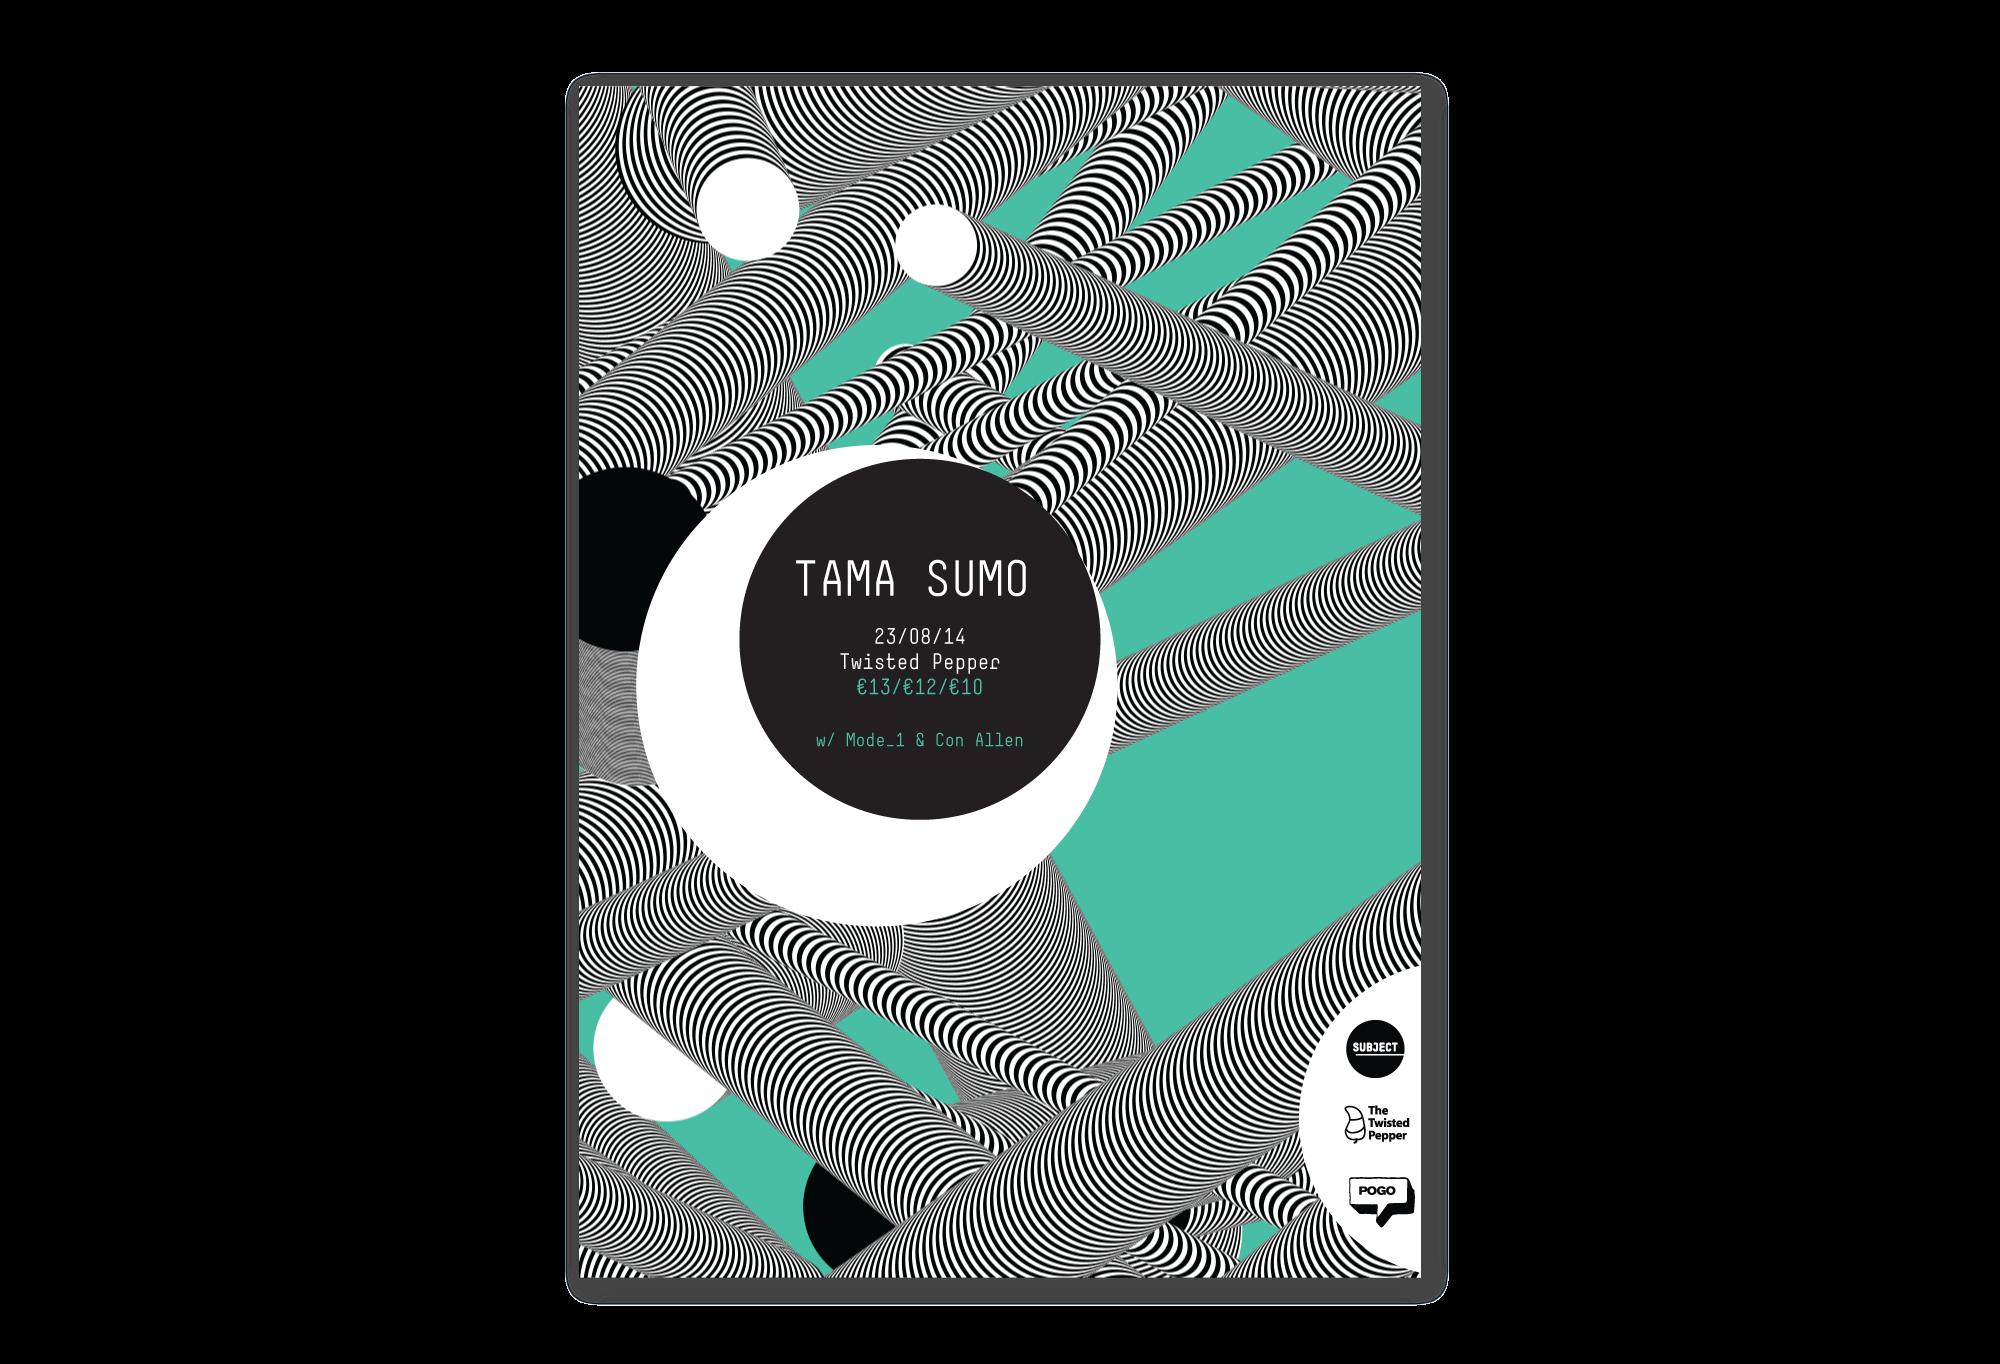 Cover image: Tama Sumo Poster